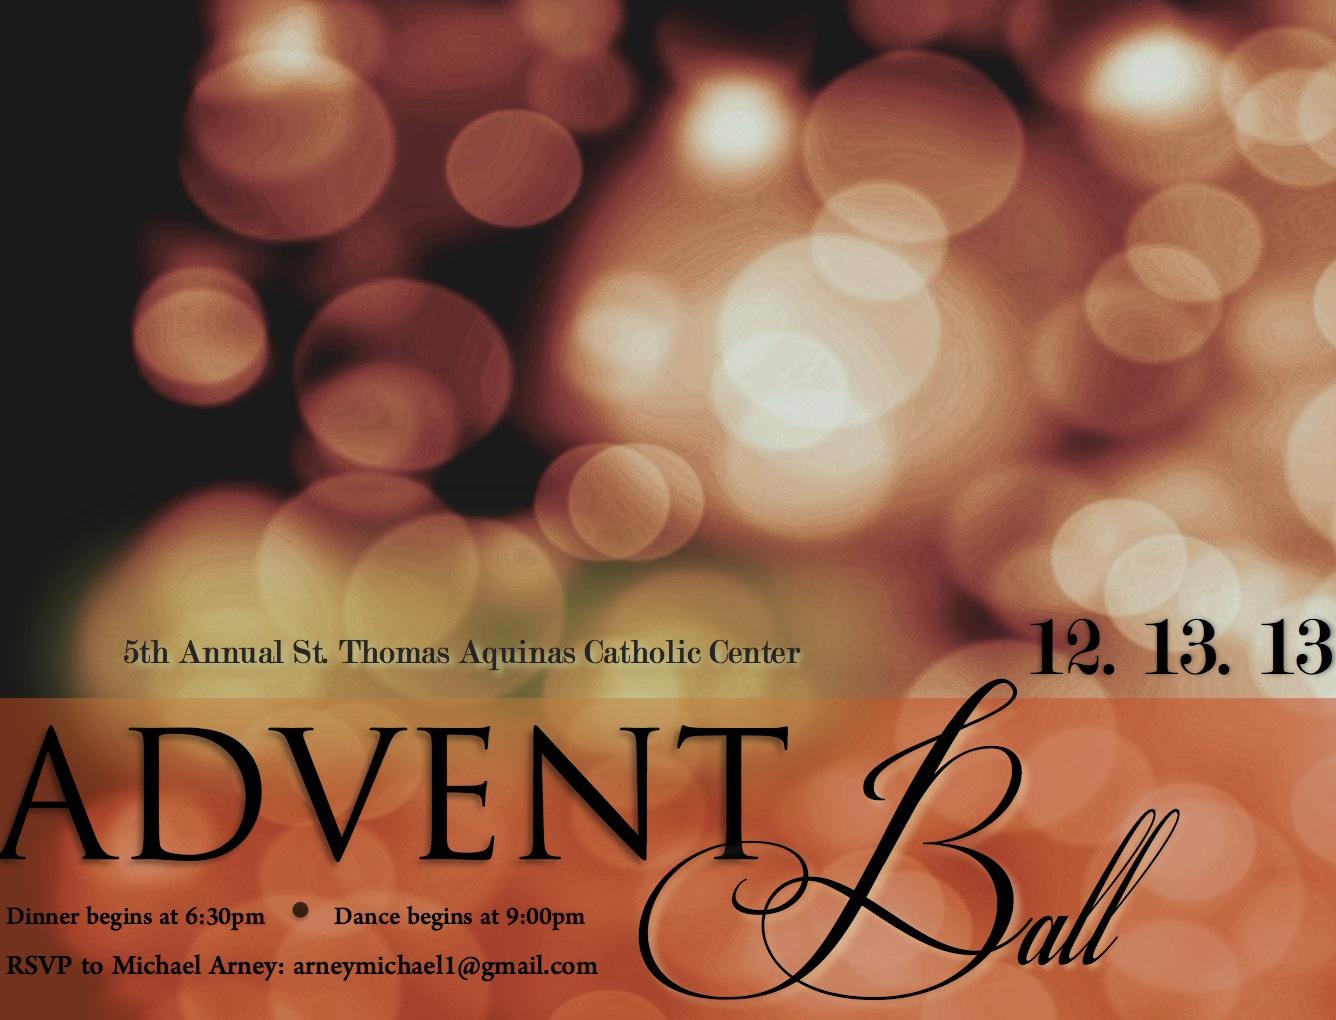 advent_ball.jpg